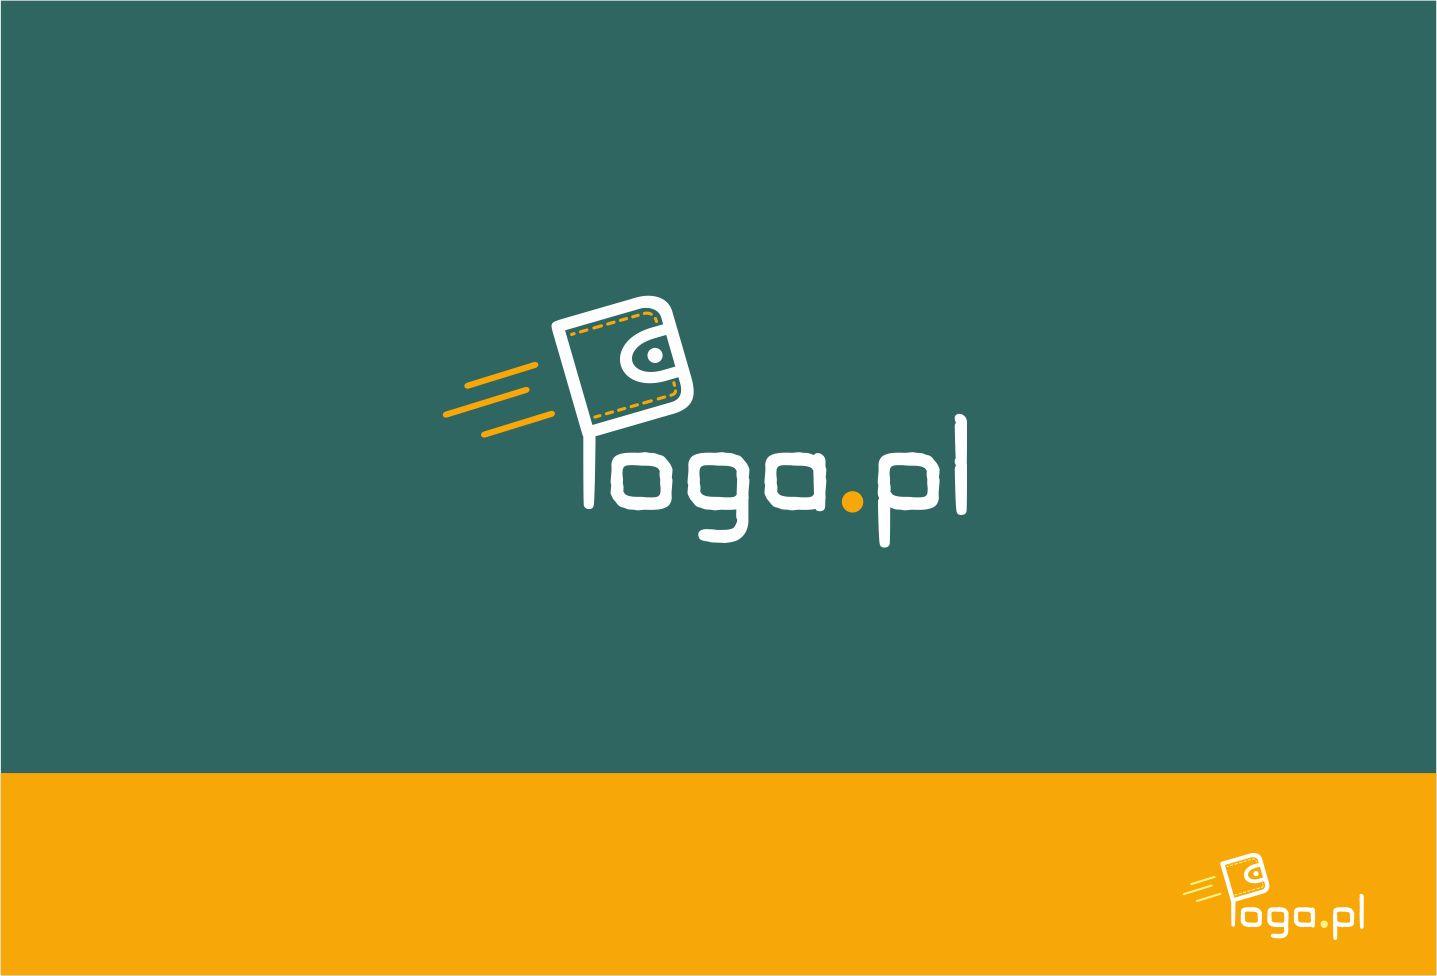 Логотип для POGA или POGA.pl - дизайнер luishamilton